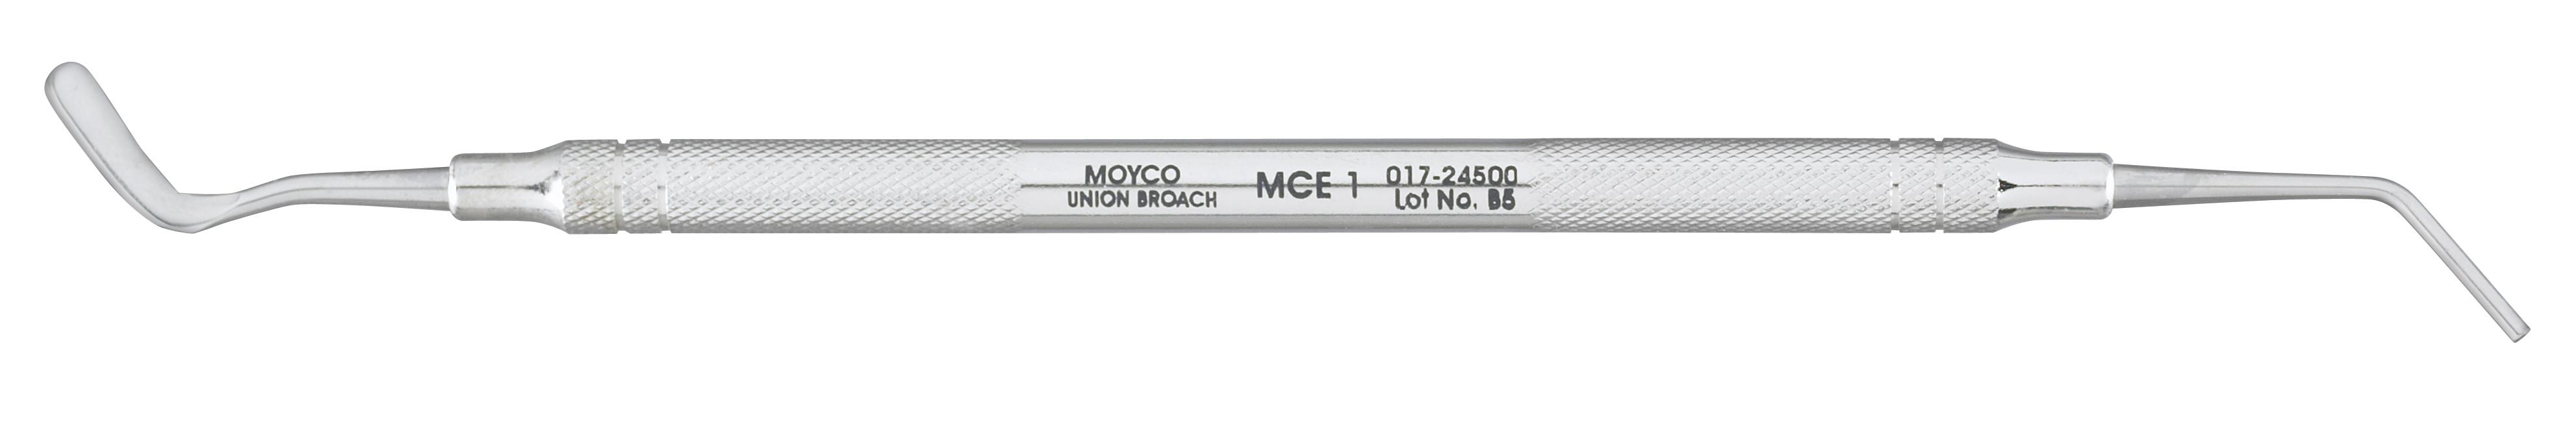 td-endo-instrument-mce-1-017-24500-miltex.jpg